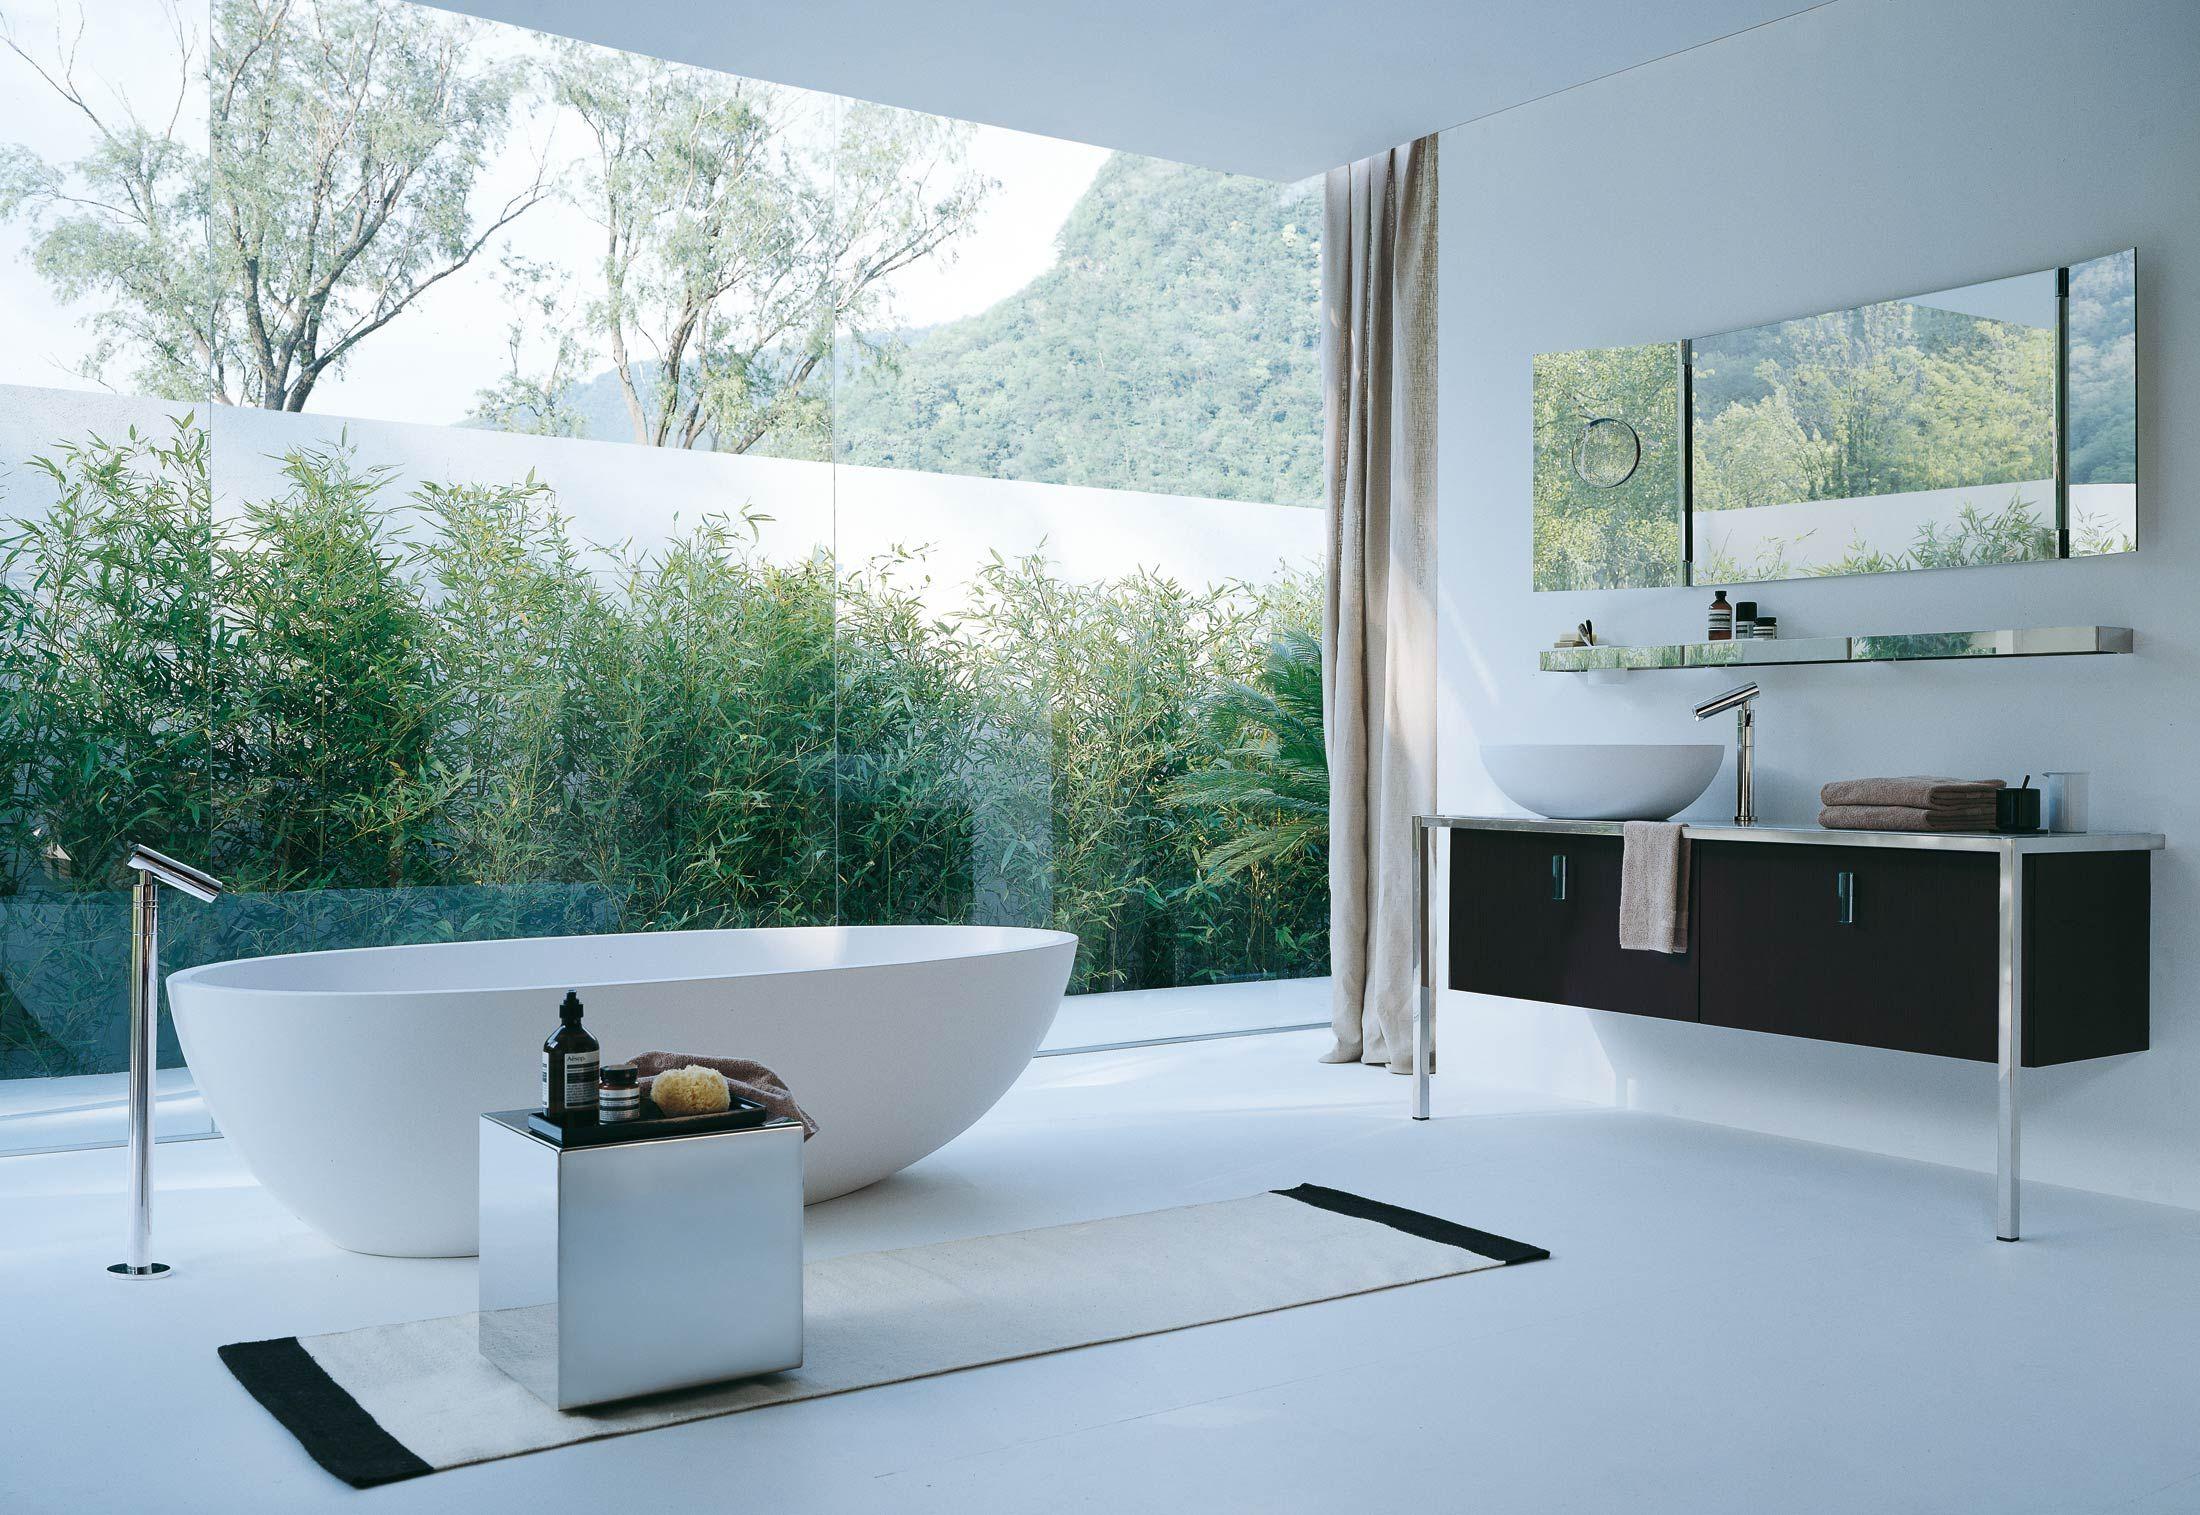 Agape Arredi di Bagno Eleganti. Casa di Bagno con luce naturale. Vasca di Bagno Freestanding  Leggete piu articoli - http://www.spazidilusso.it/